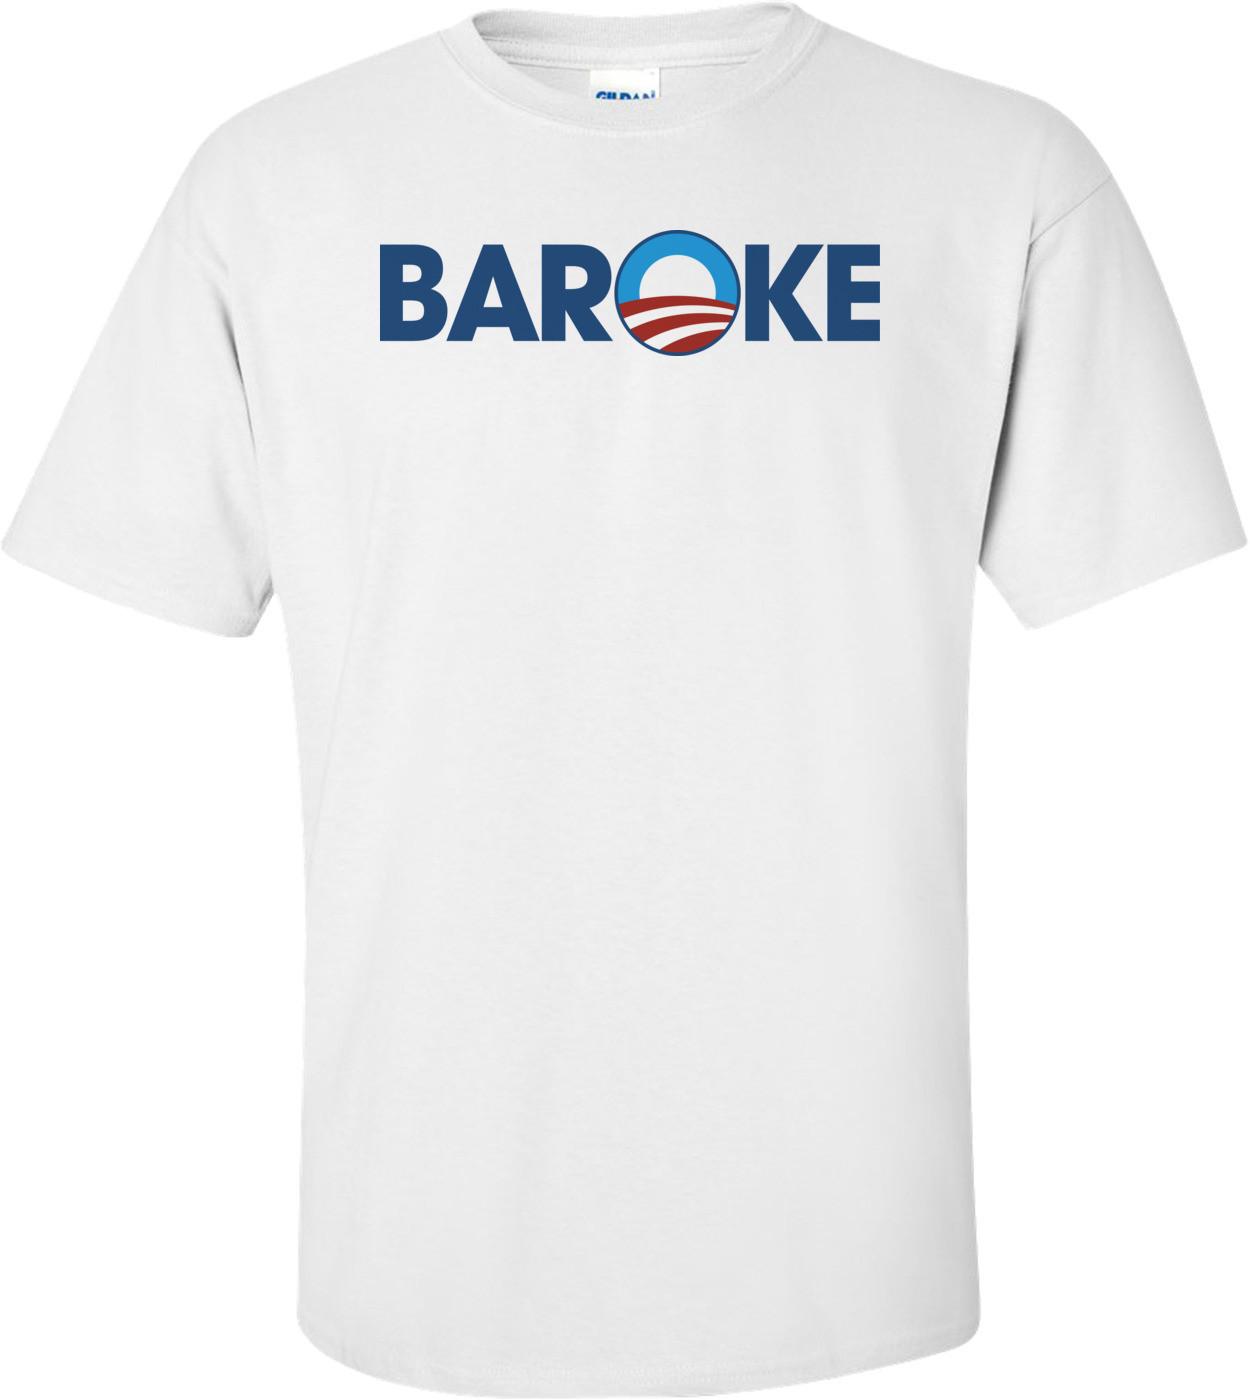 Baroke T-shirt Anti-obama T-shirt